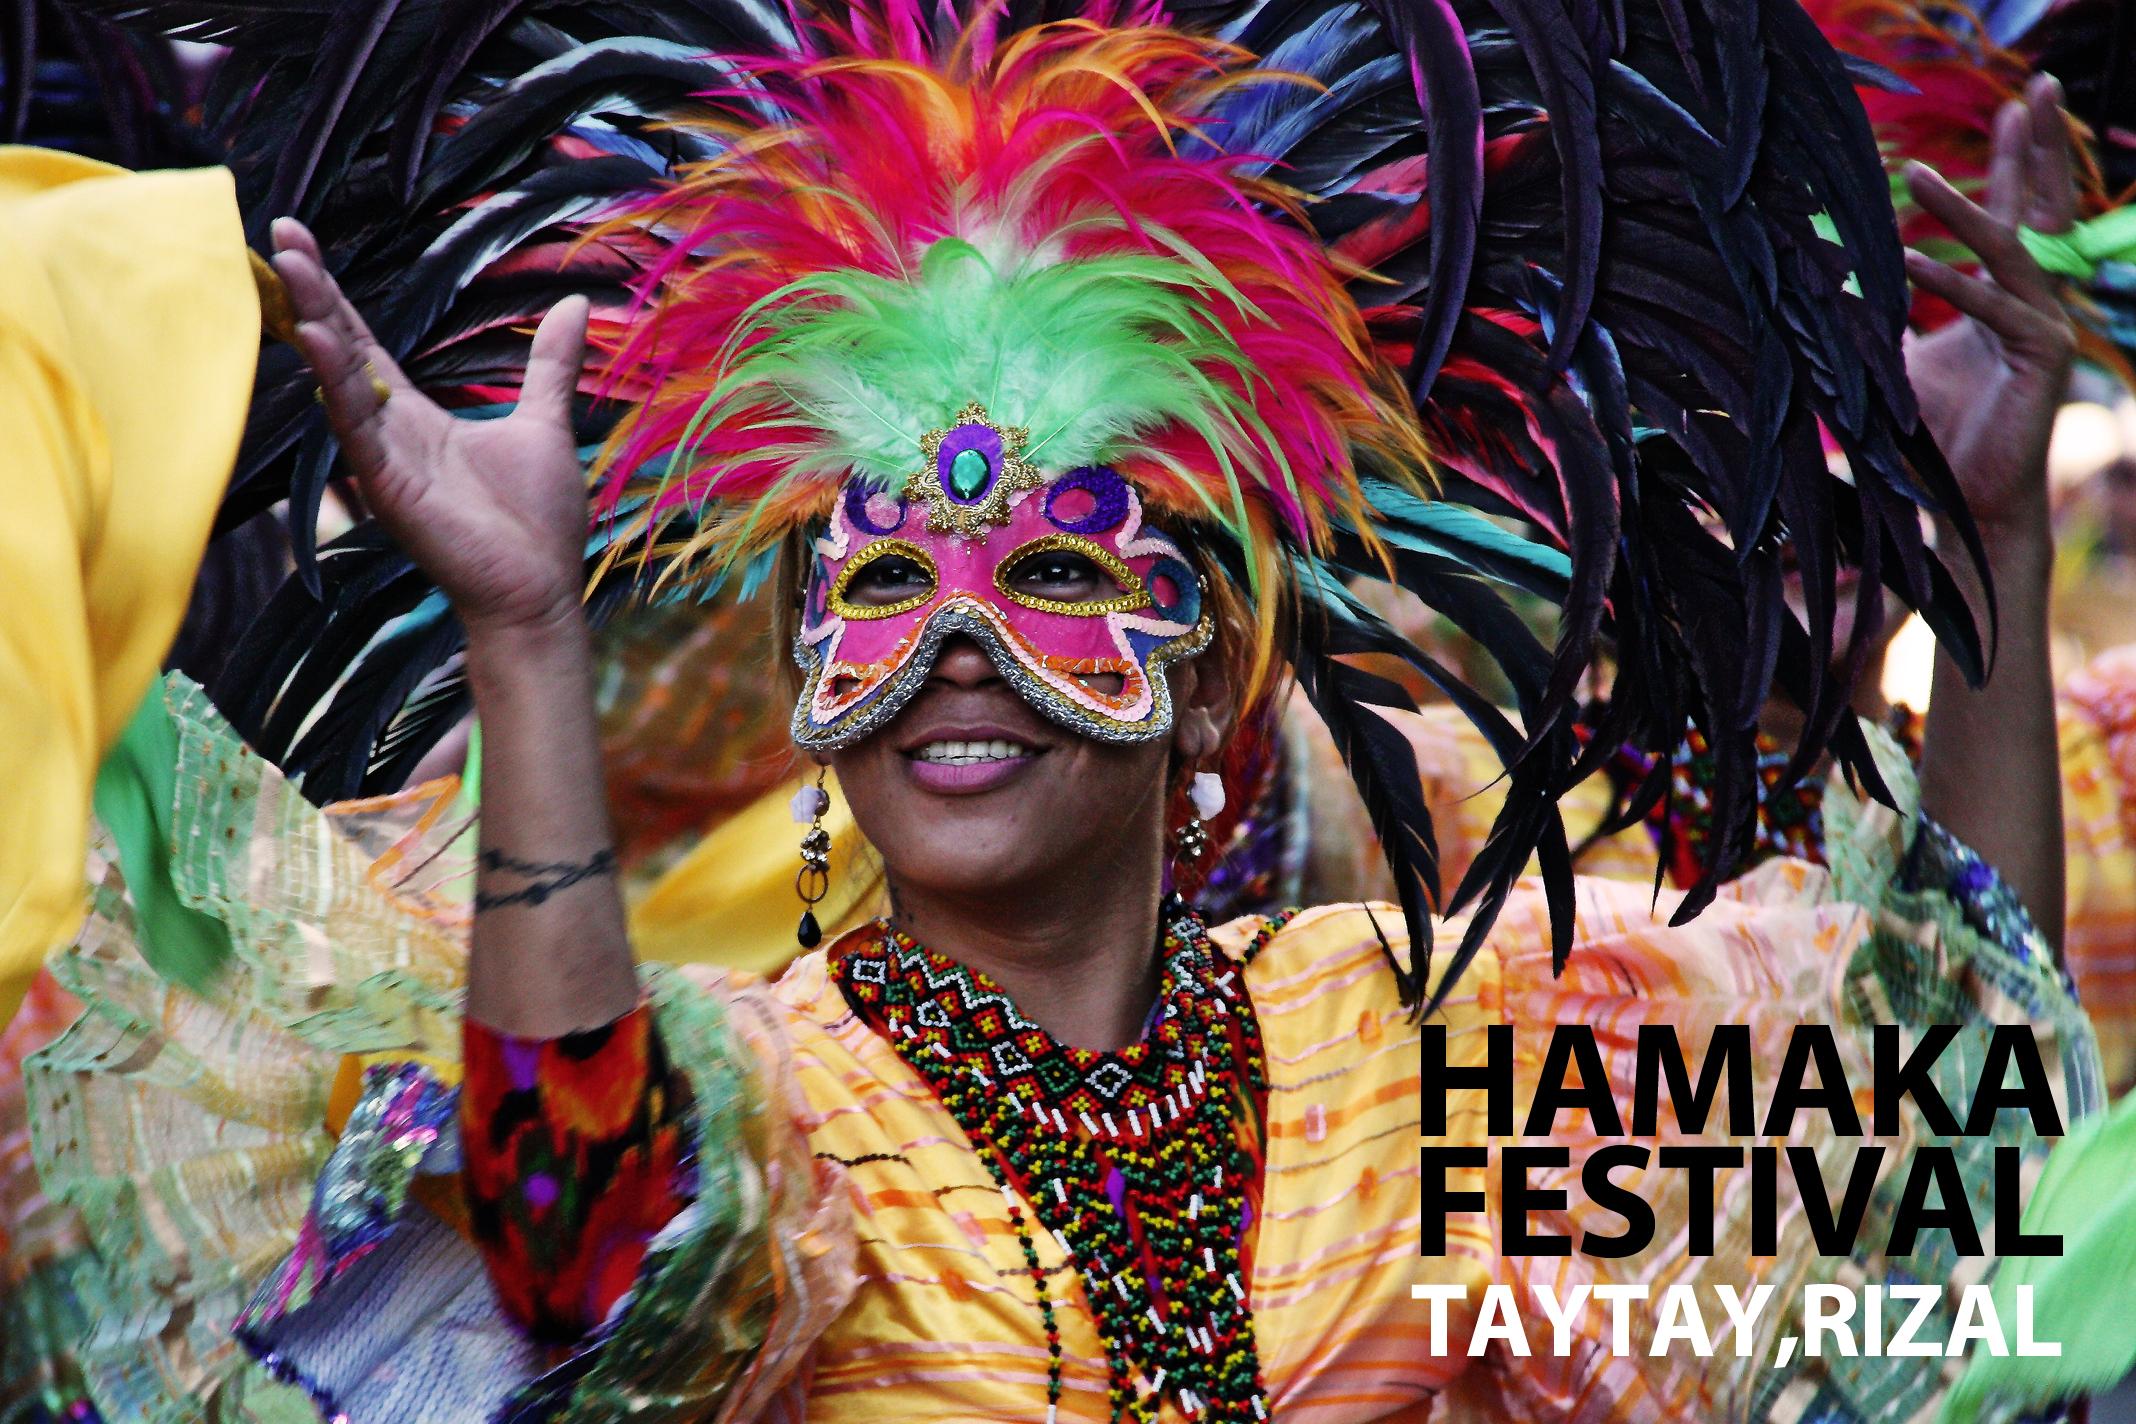 Hamaka festival